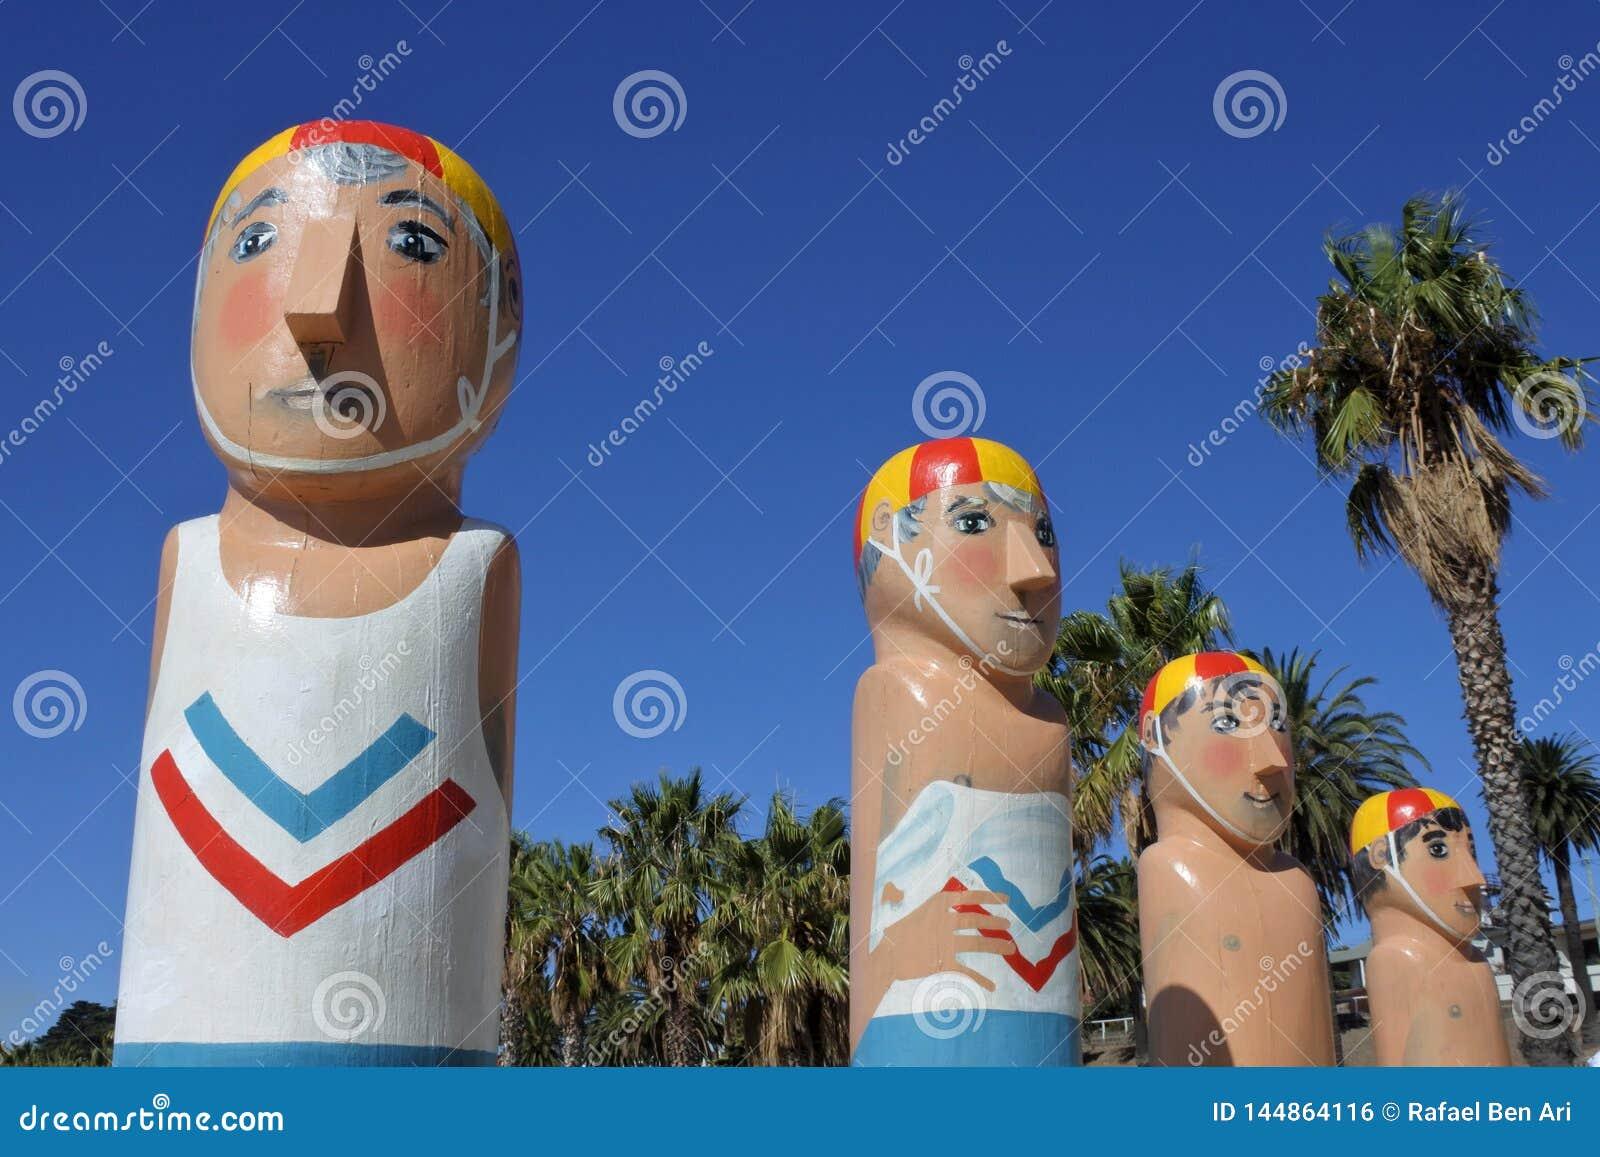 Baywalk Bollards sculptures in Geelong Melbourne Victoria Australia